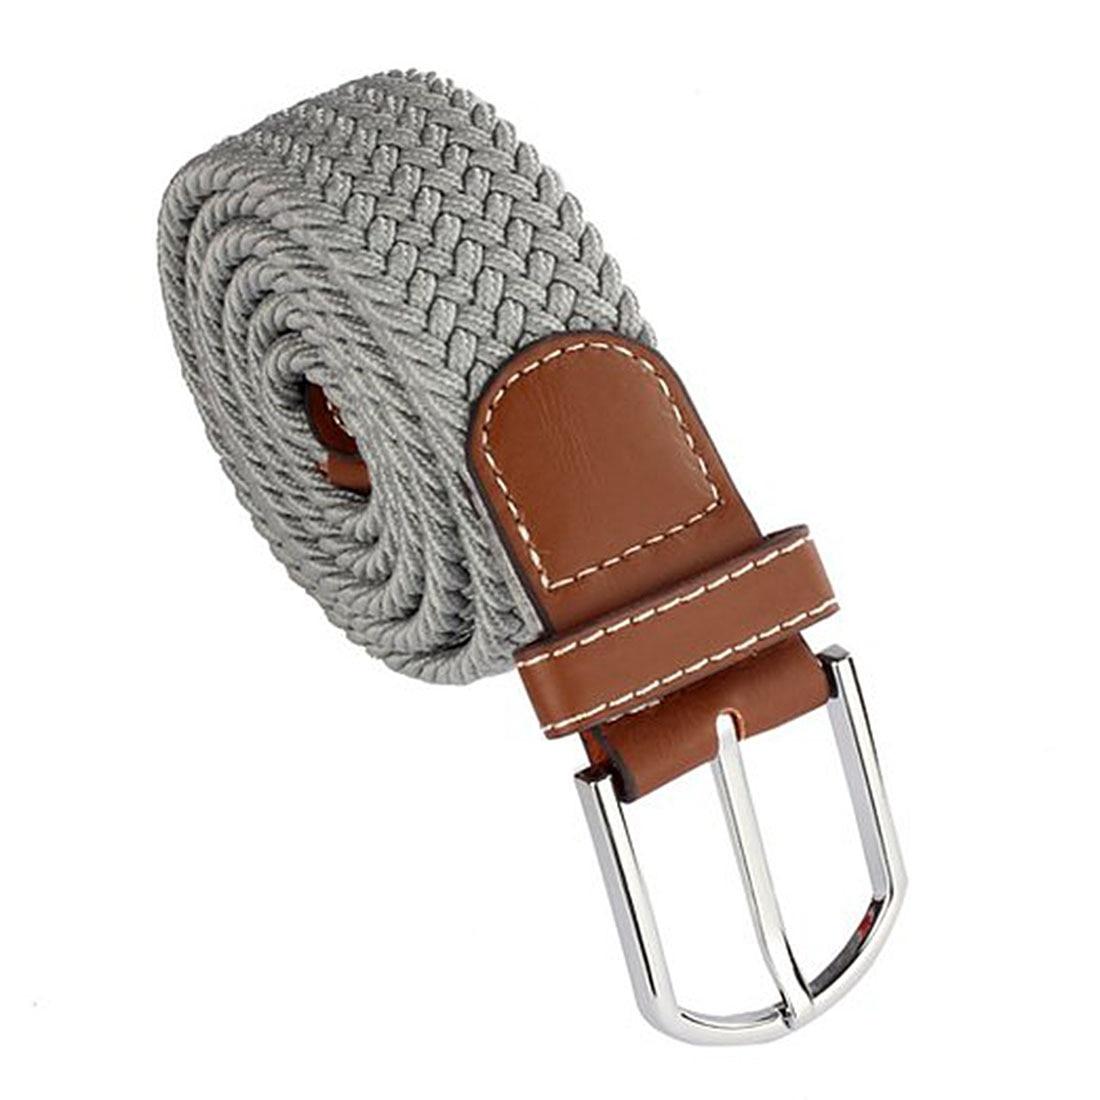 Men Leather Braided Elastic Stretch Metal Buckle   Belt   Waistband Light gray